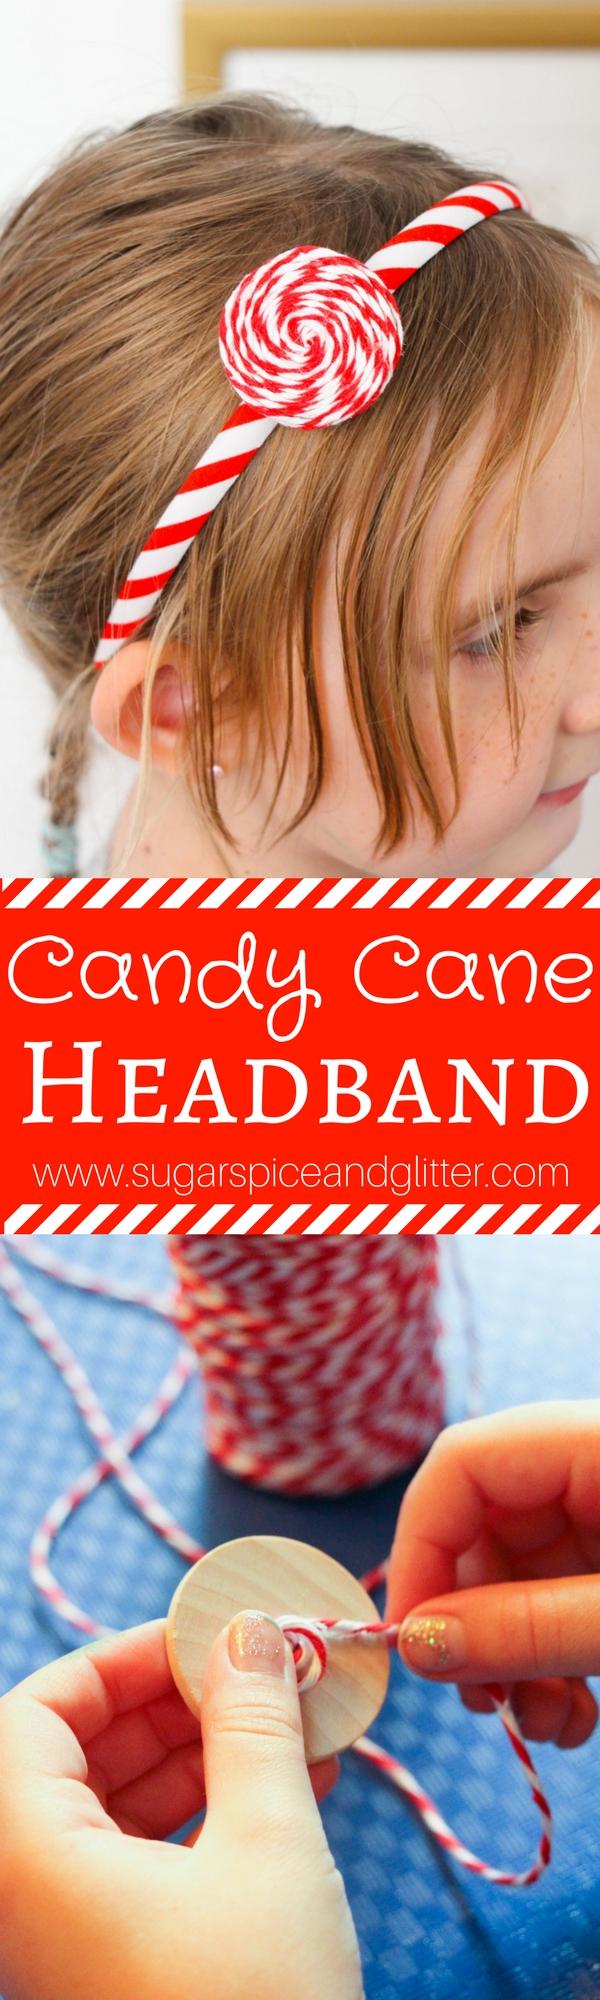 Peppermint Swirl Headband